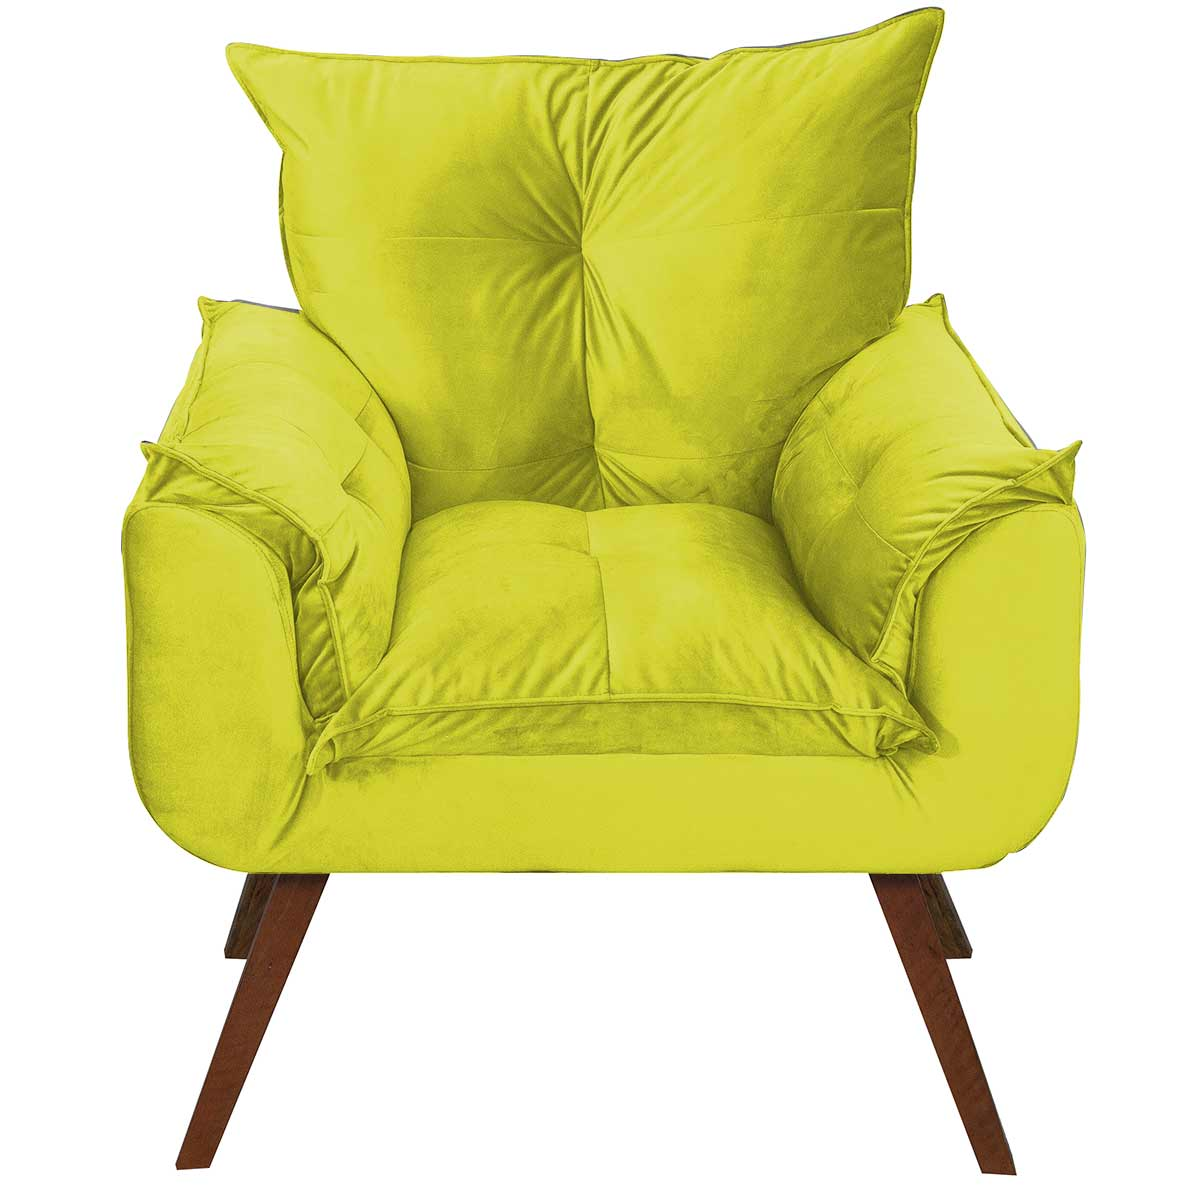 Poltrona Decorativa Opala  Animale Amarelo